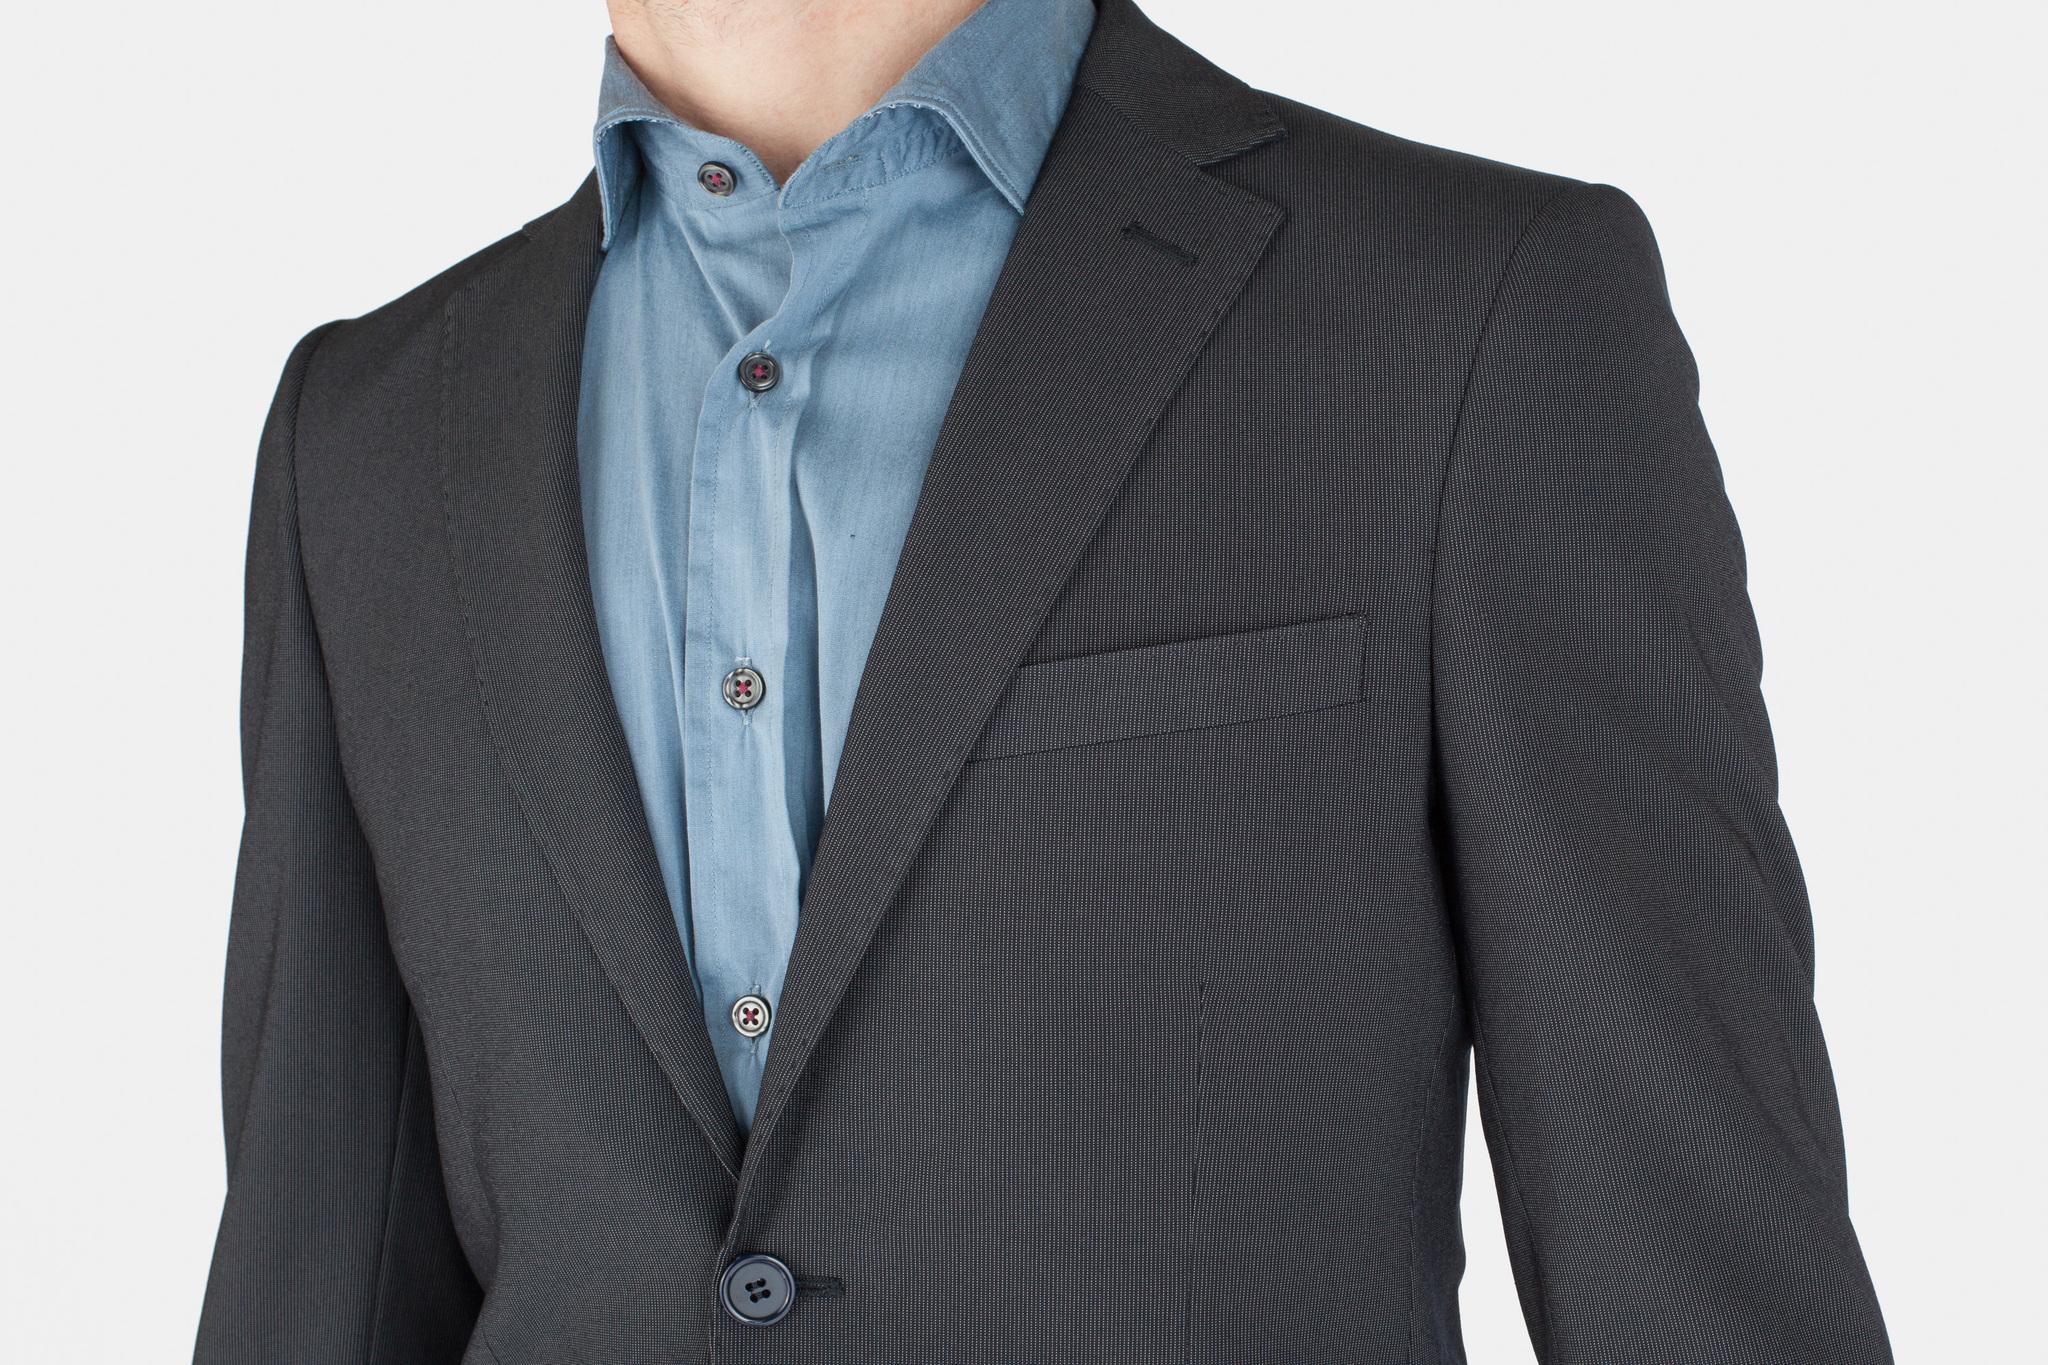 Тёмно-синий шерстяной костюм, нагрудный карман